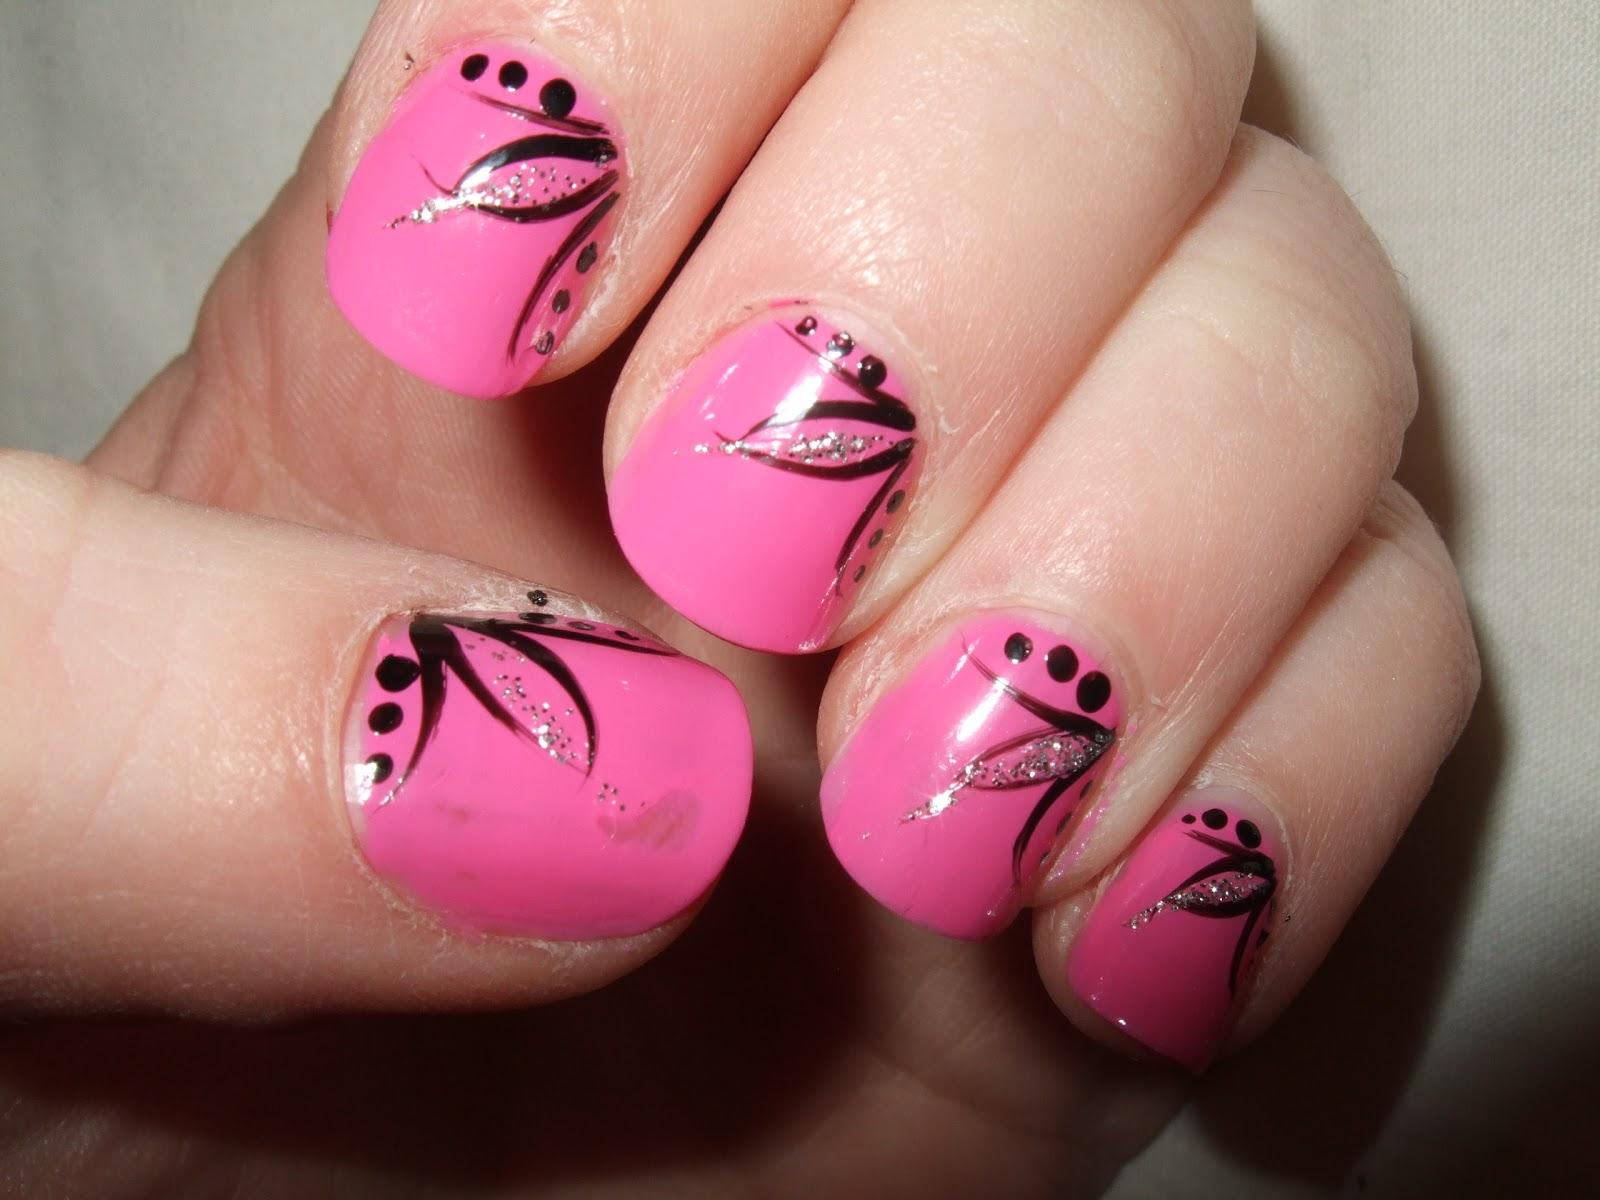 Oooooh Pretty: My first ever Nail Art Design!